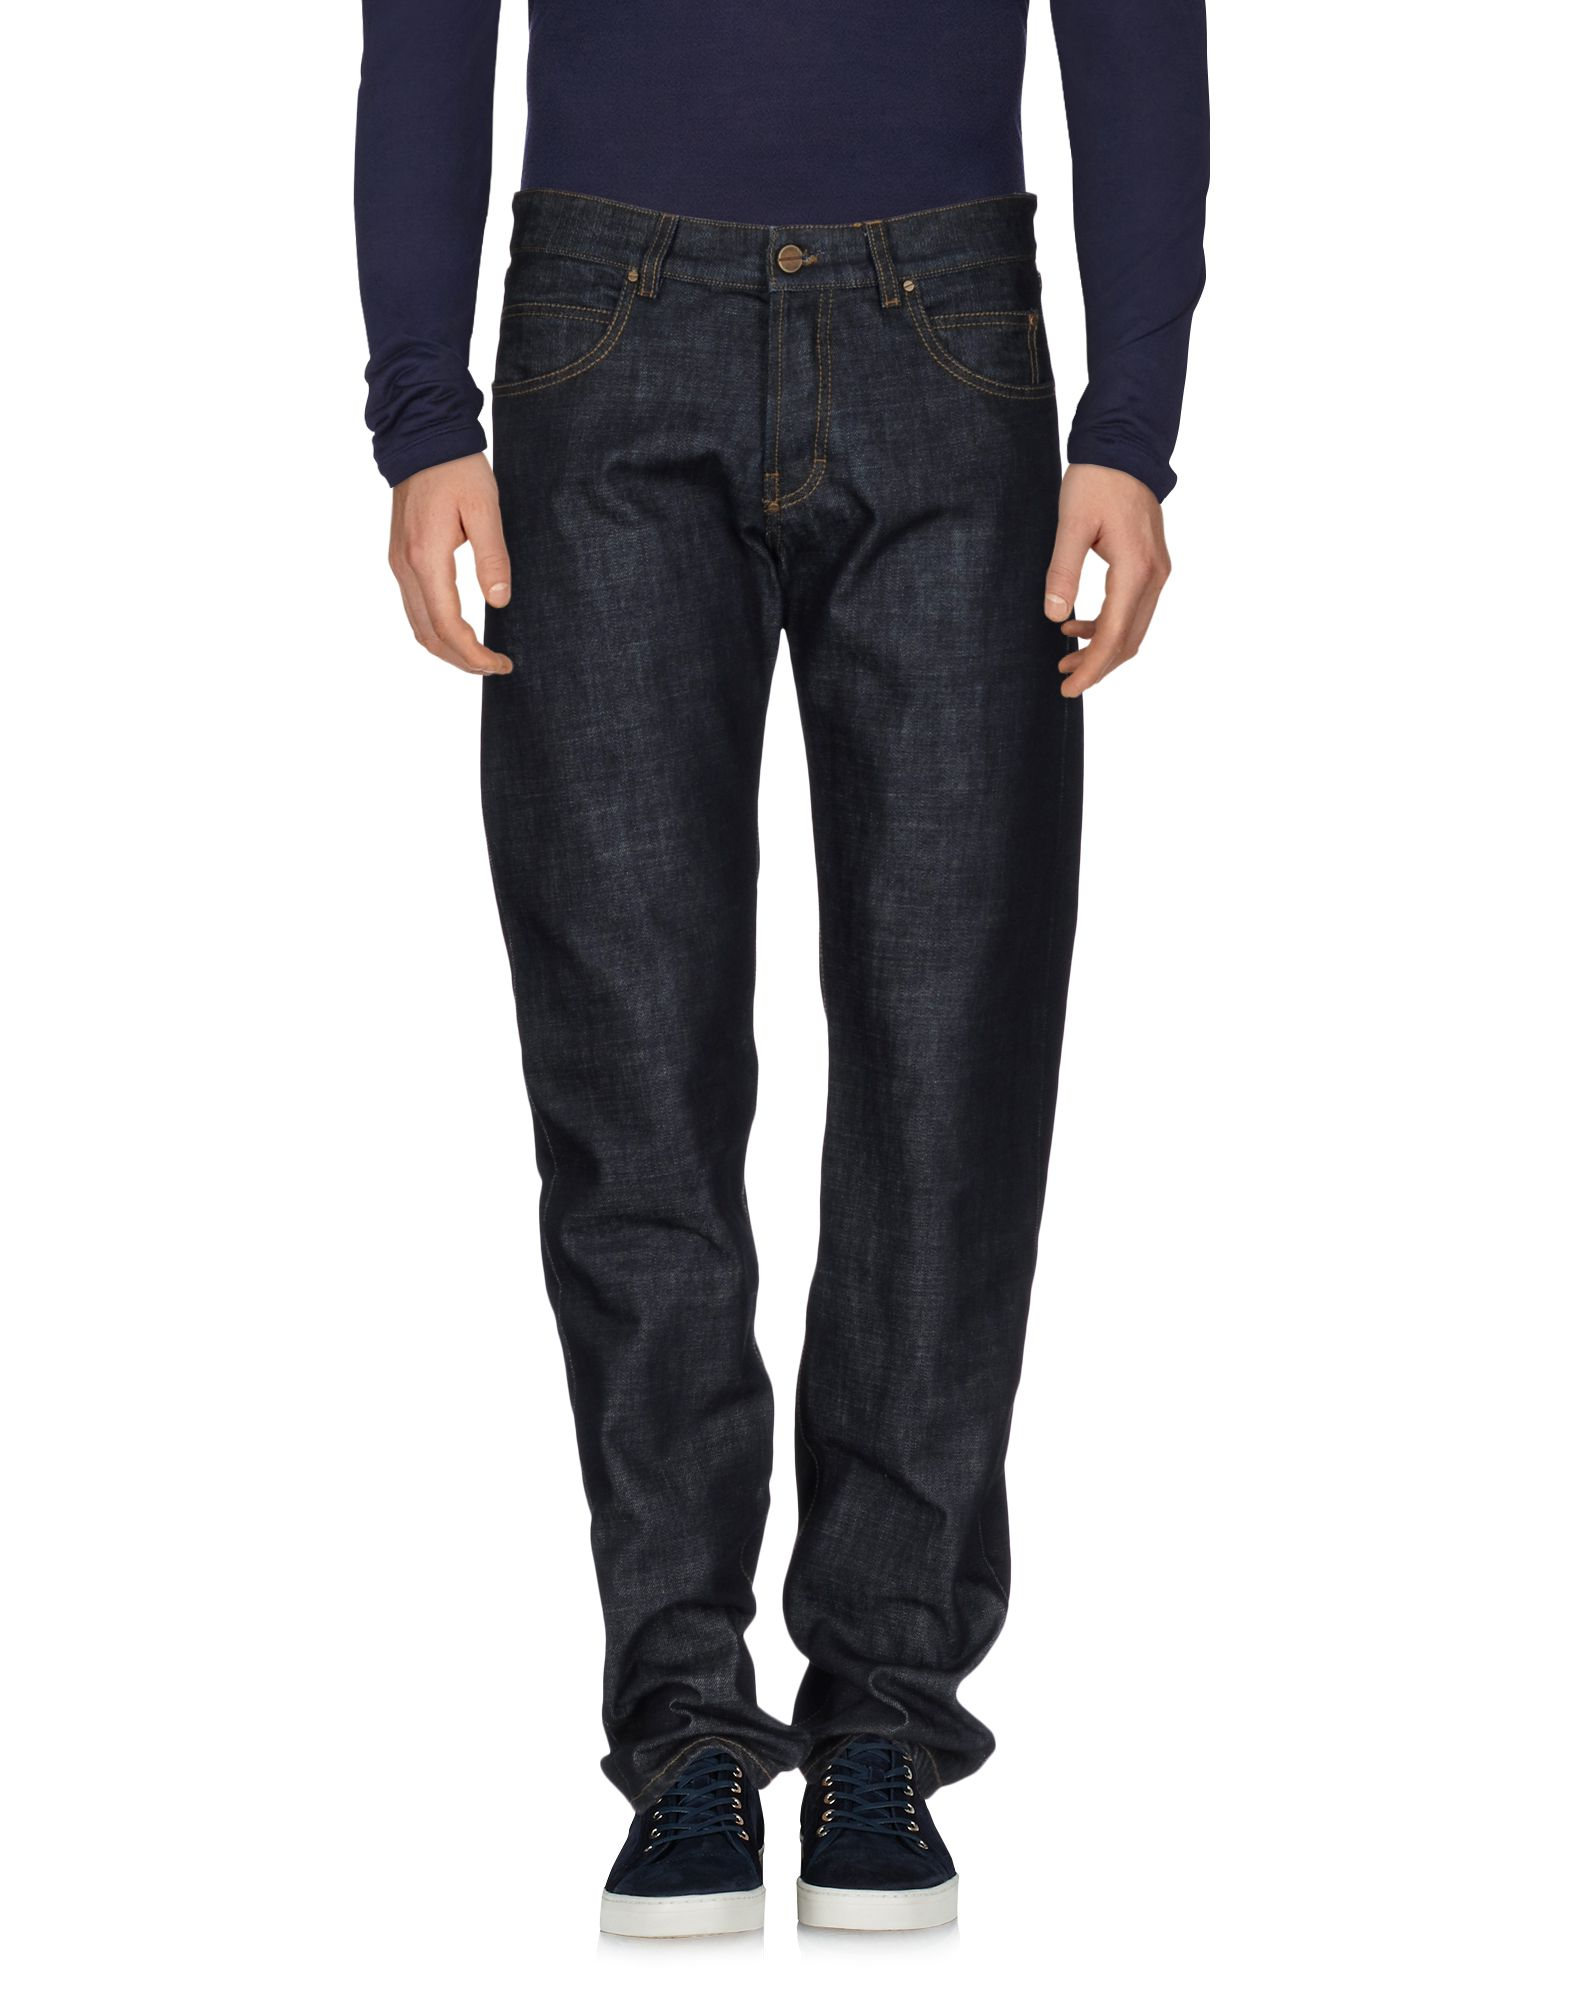 GAETANO NAVARRA Джинсовые брюки цены онлайн